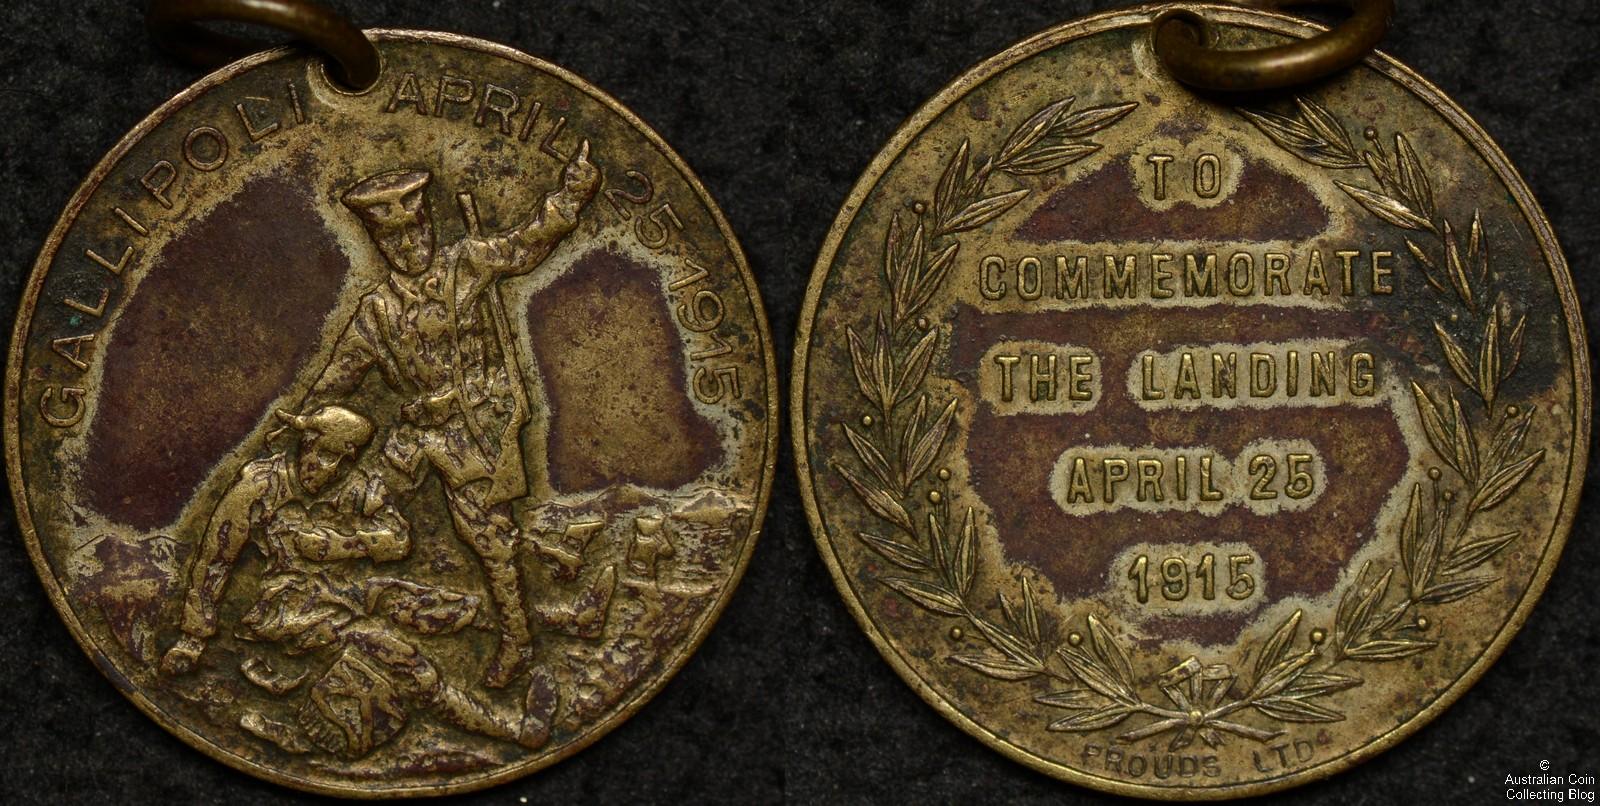 Australia 1915 To Commemorate the Landing Medallion